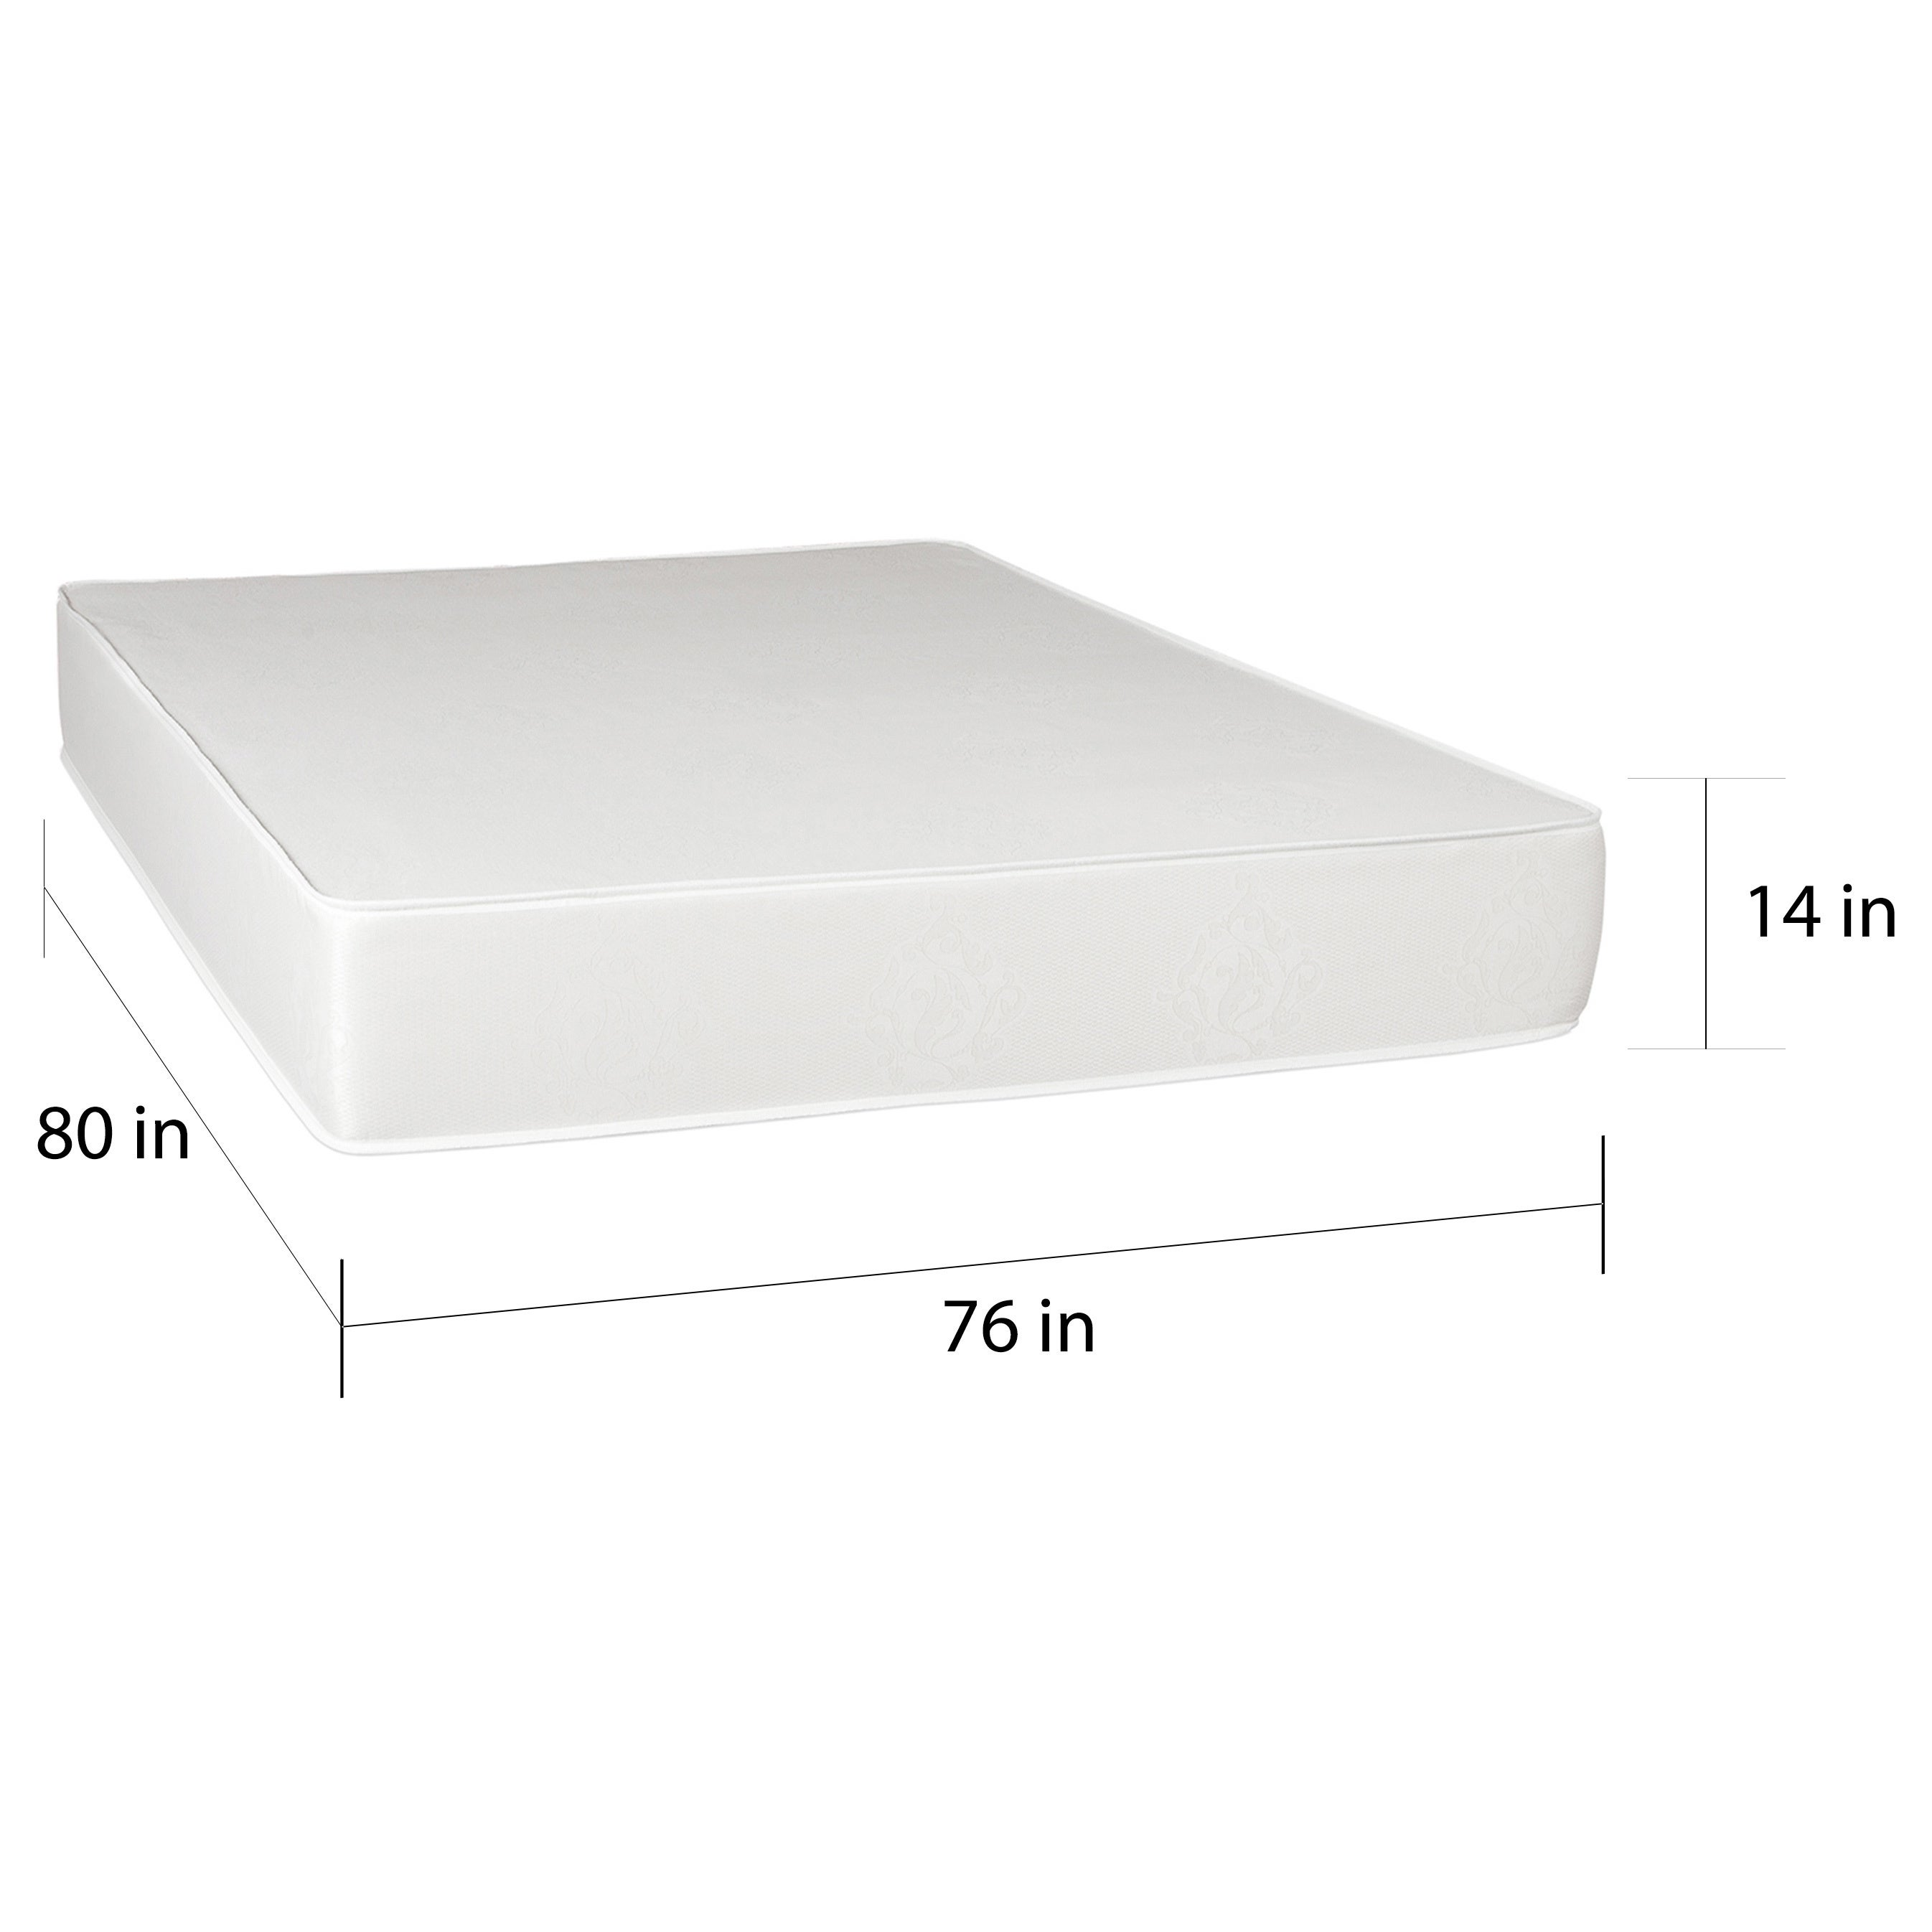 Select Luxury Medium Firm 14 inch King size Memory Foam Mattress